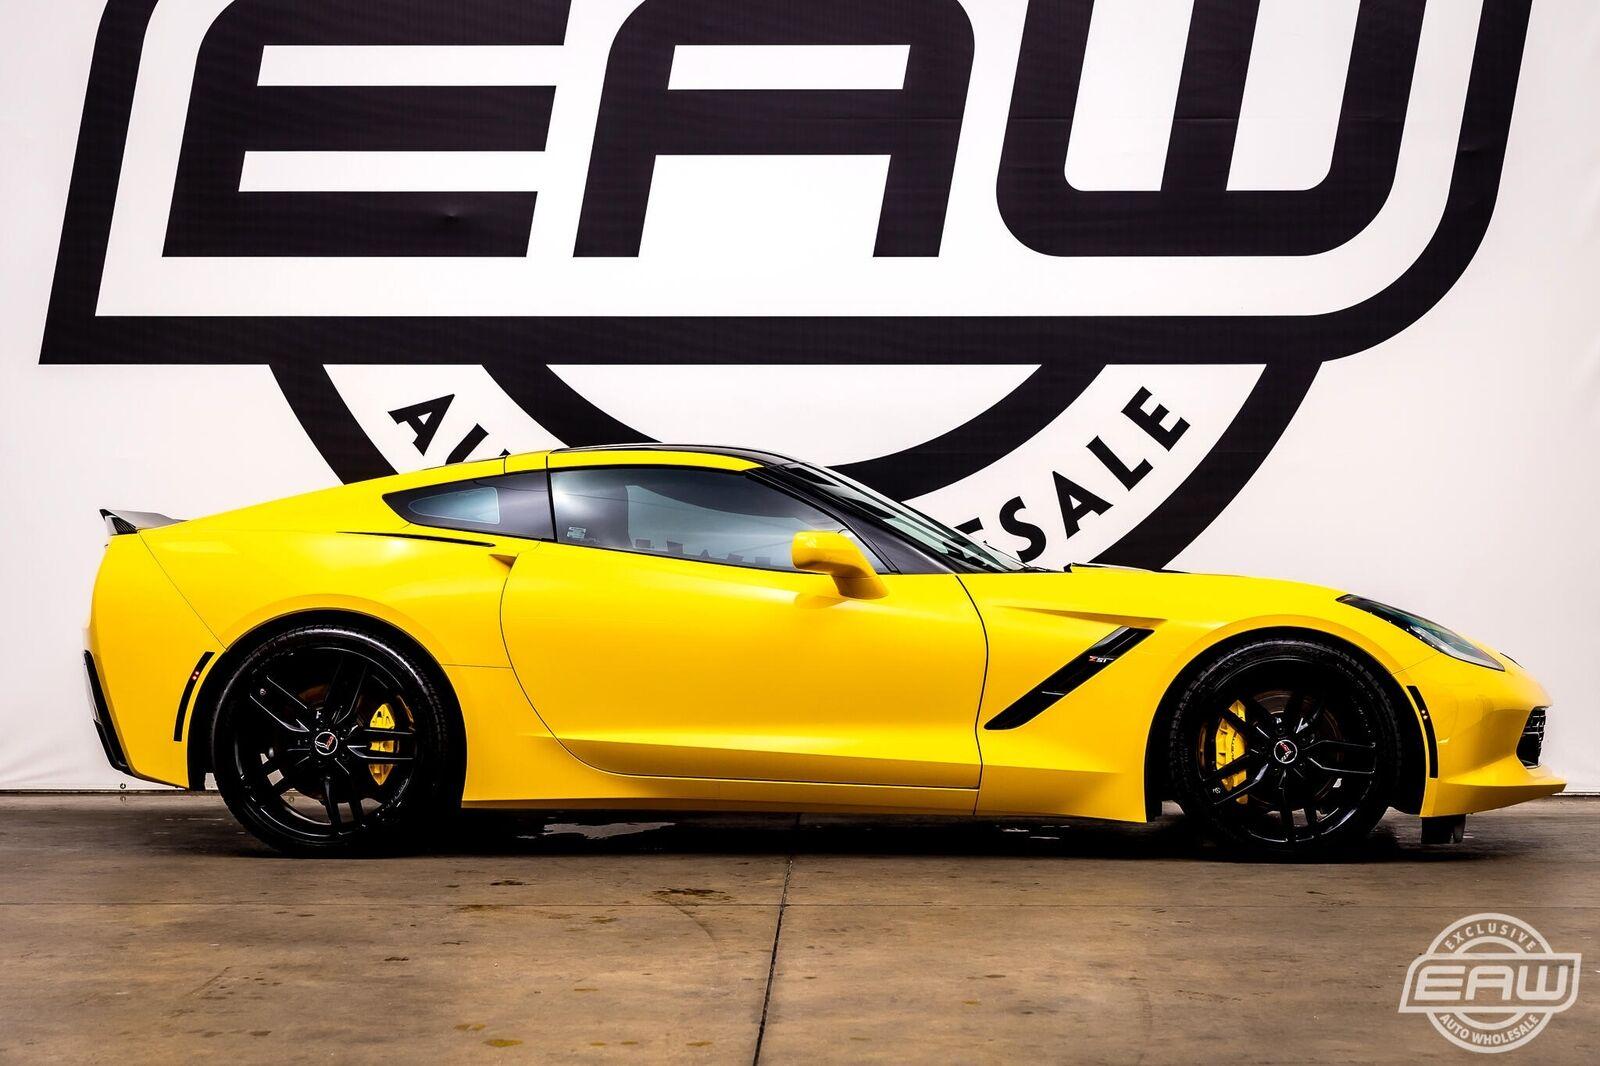 2014 Yellow Chevrolet Corvette Coupe 2LT   C7 Corvette Photo 9